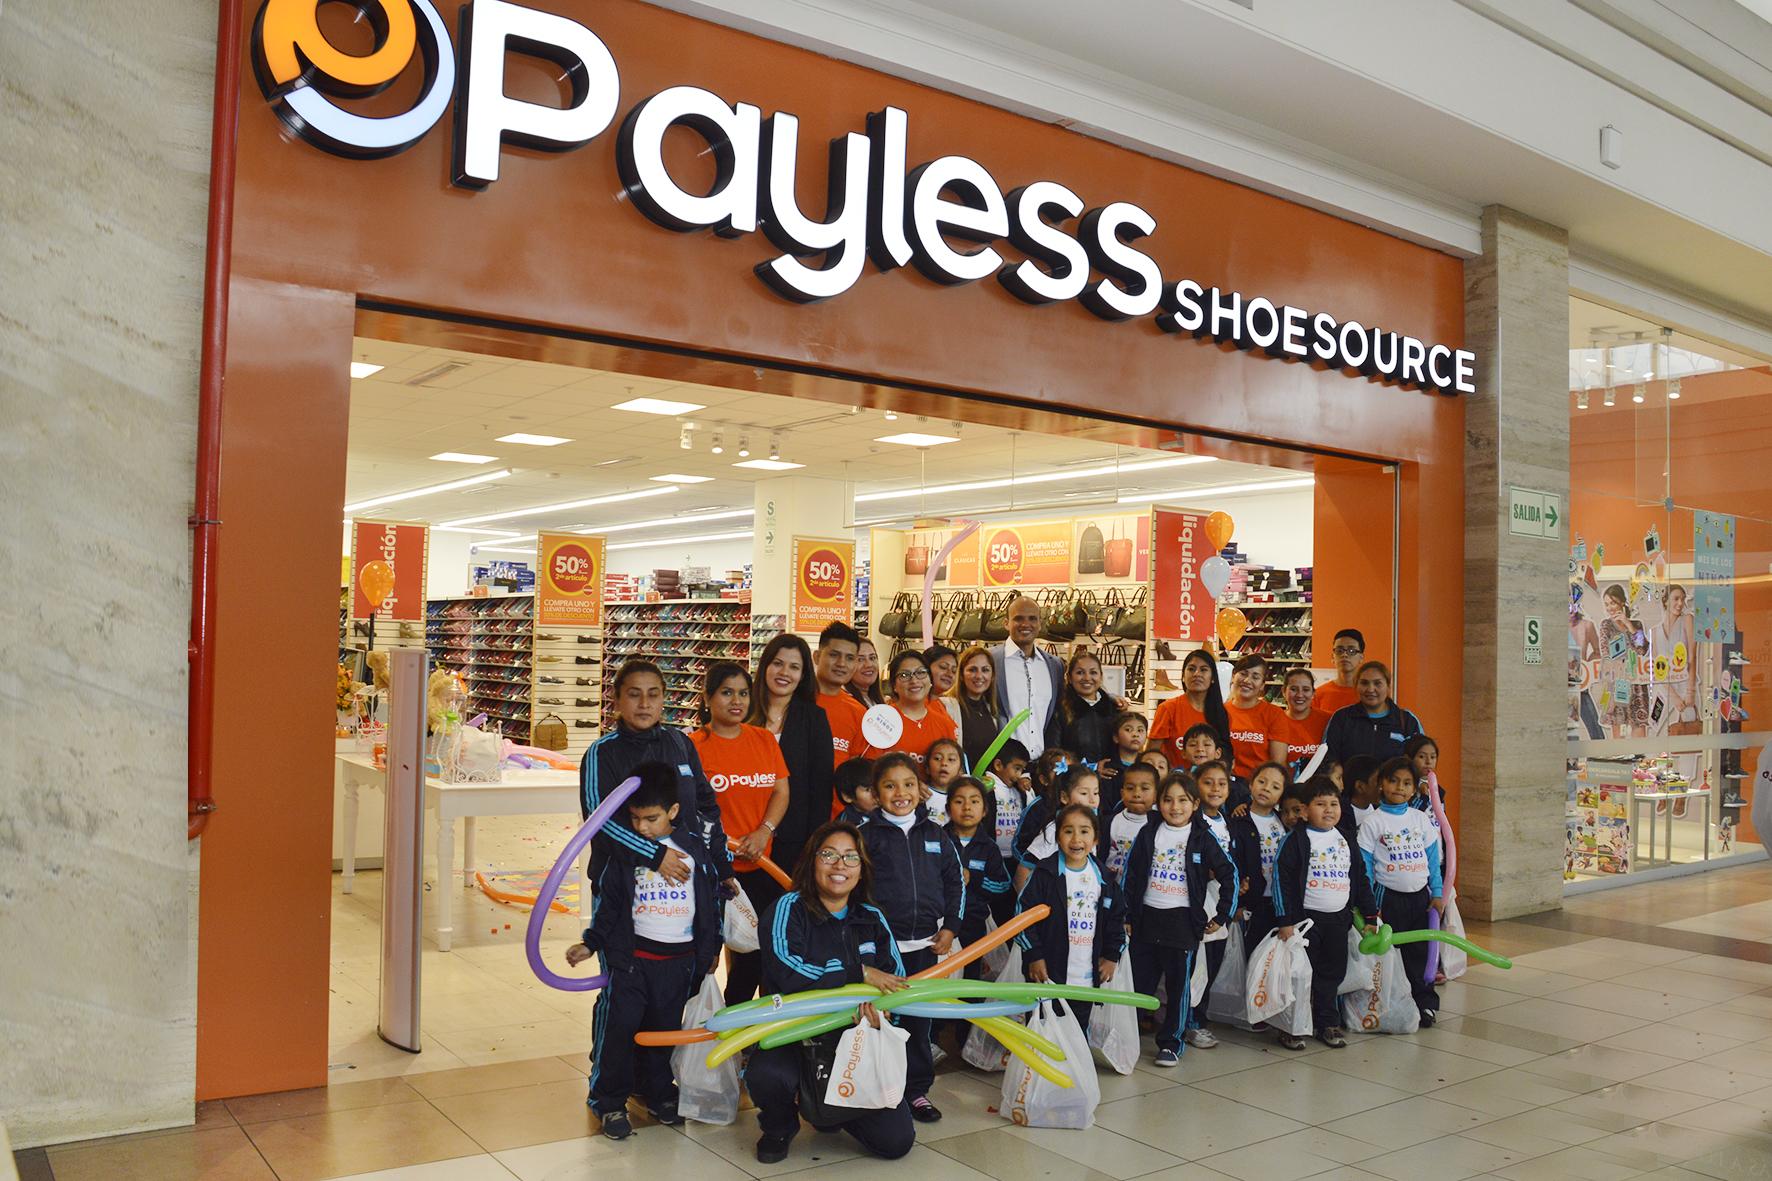 Payless foto 2 - Payless Shoesource realizó importante entrega a Aldeas Infantiles SOS Perú